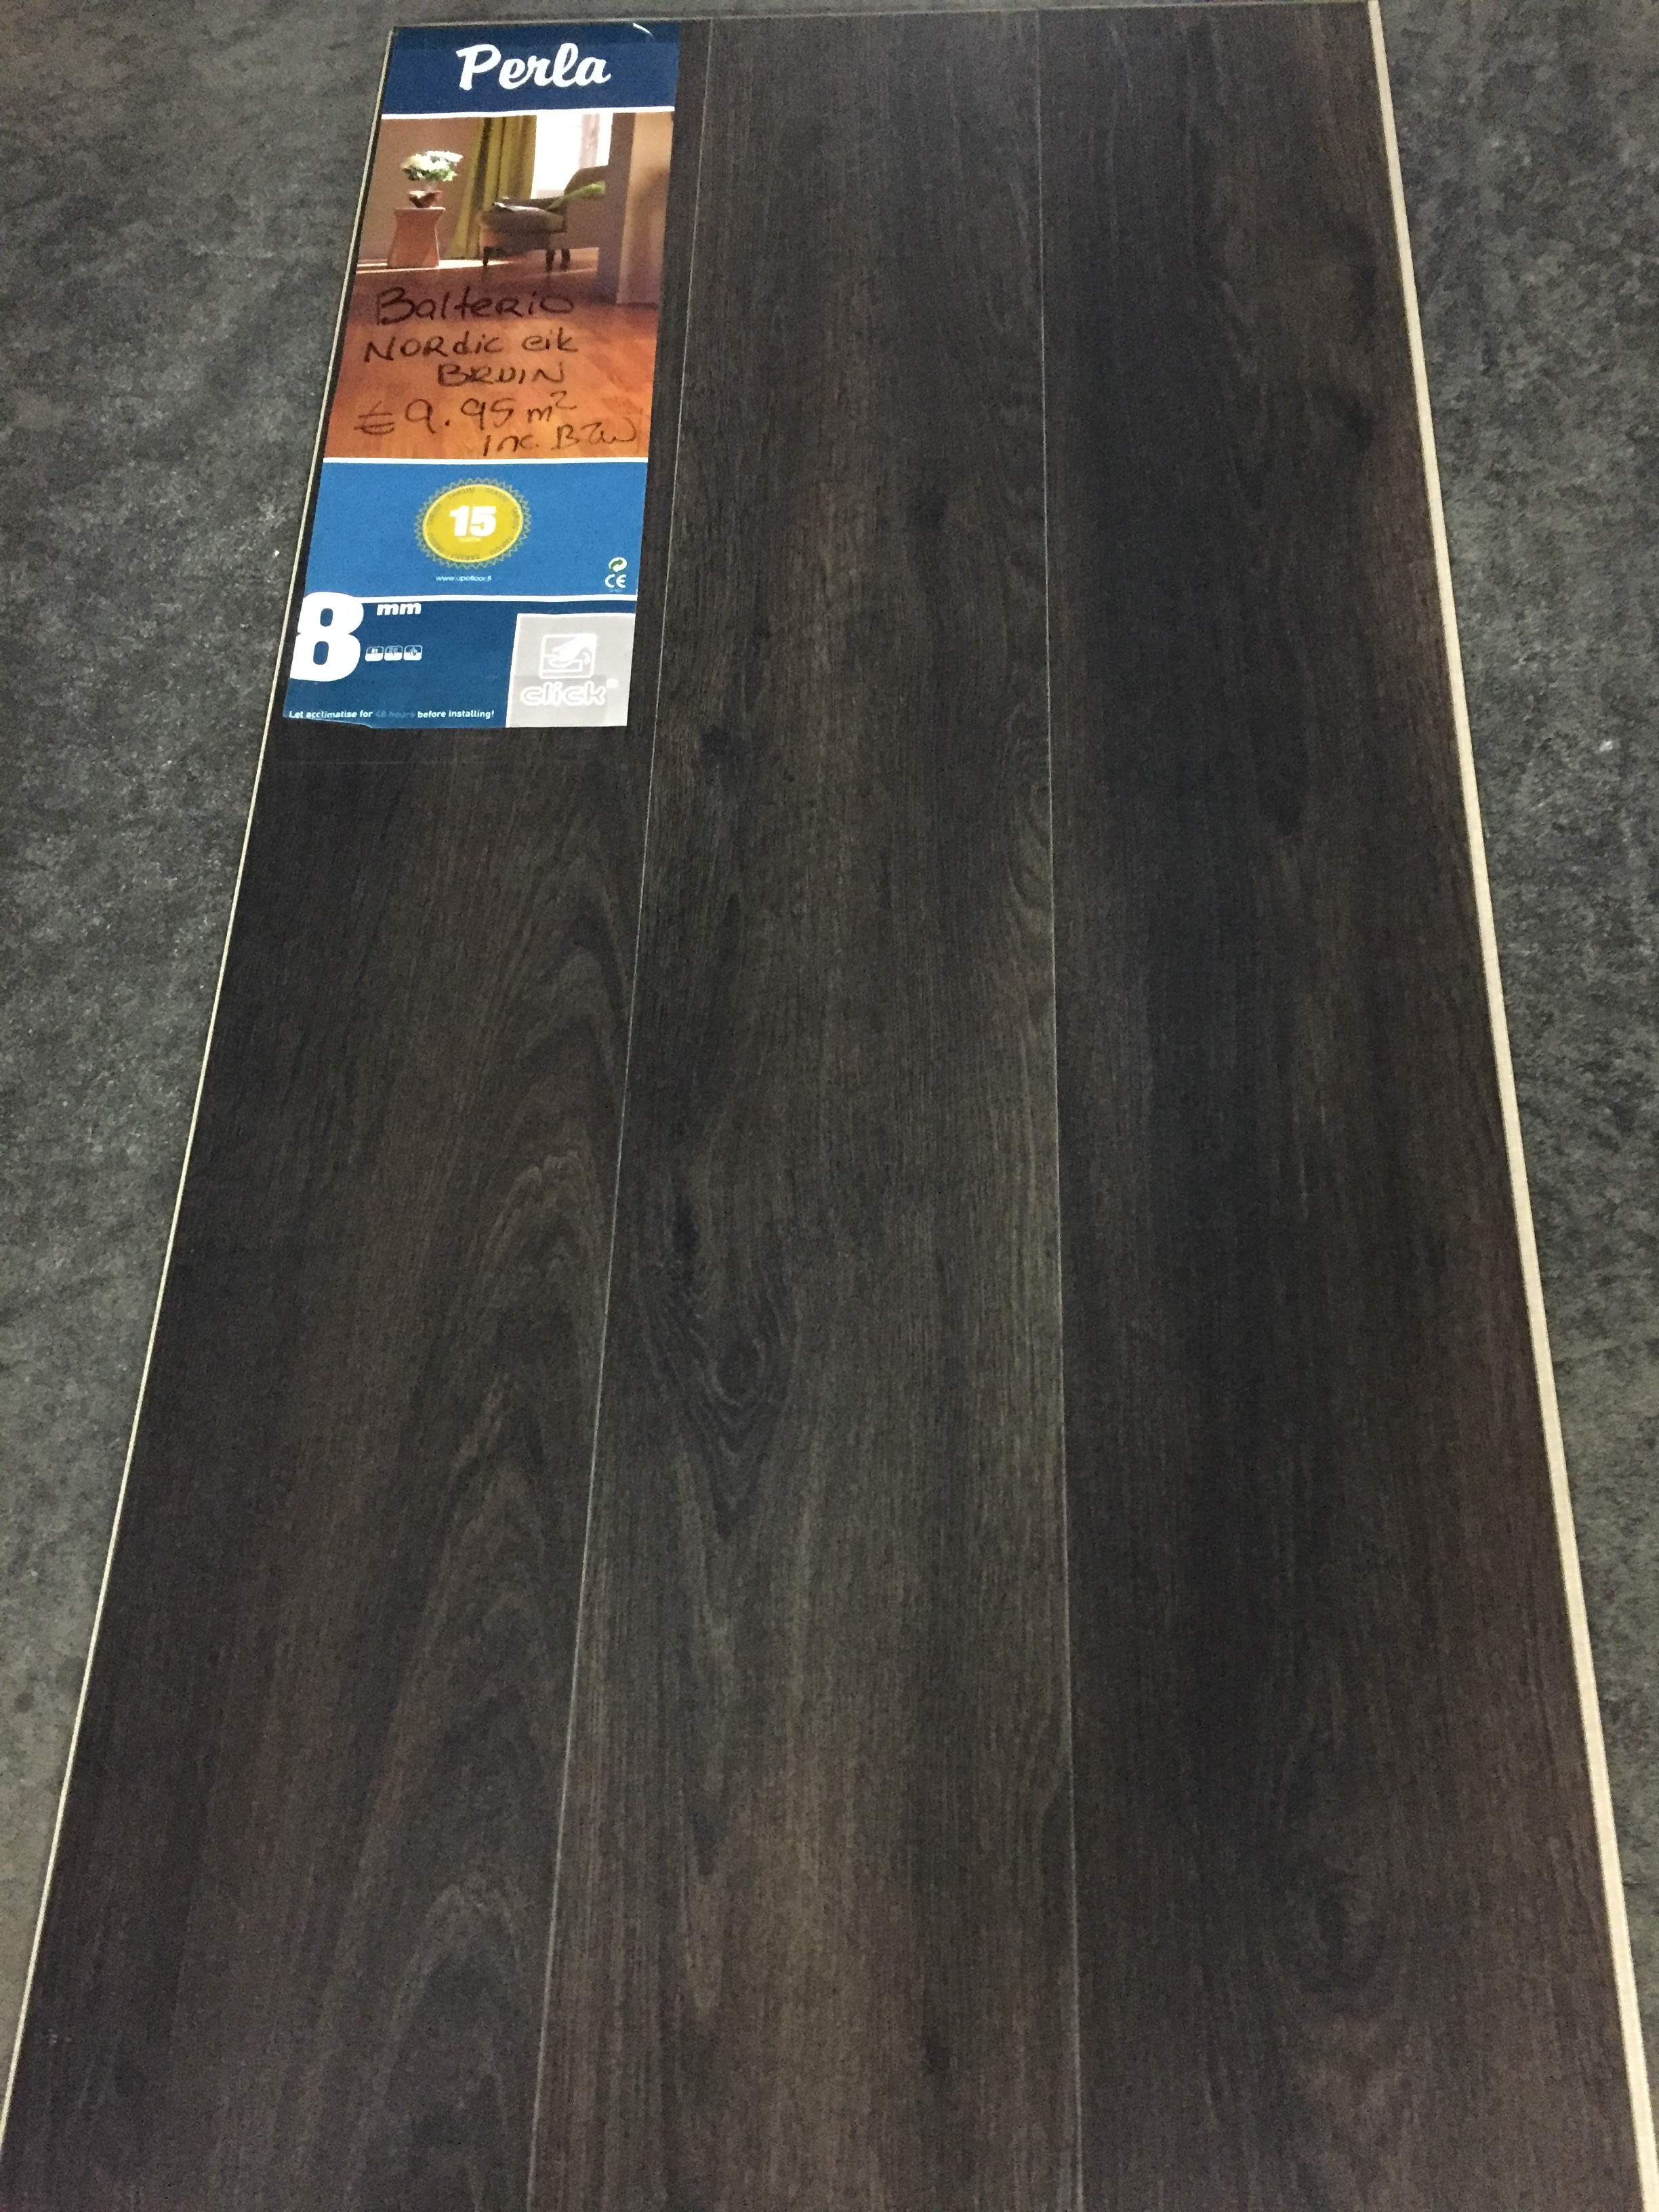 laminaat nordic oak donker bruin zwart 8mm dik